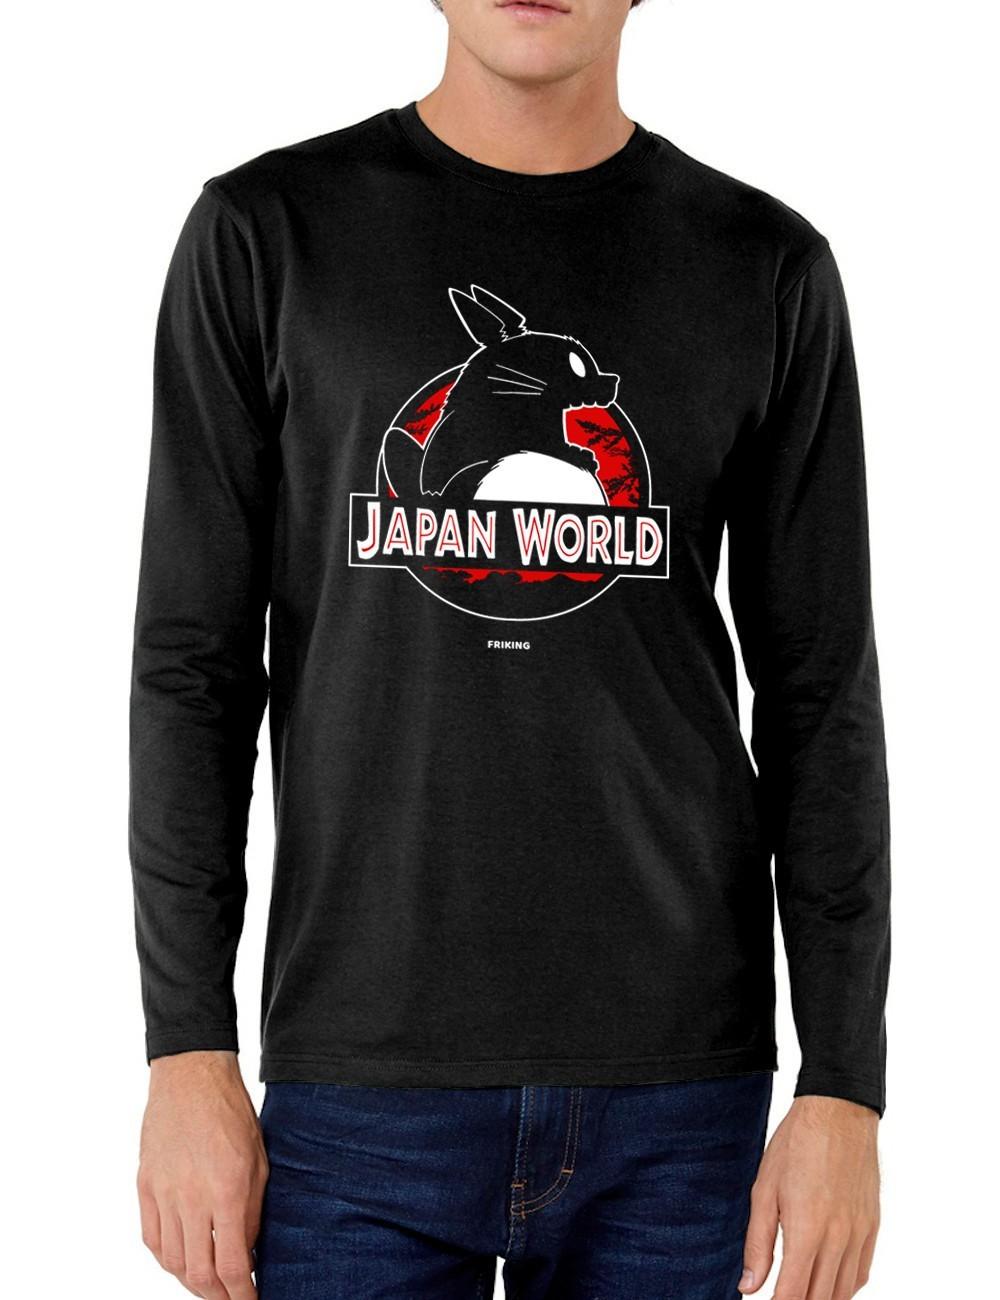 Japan World